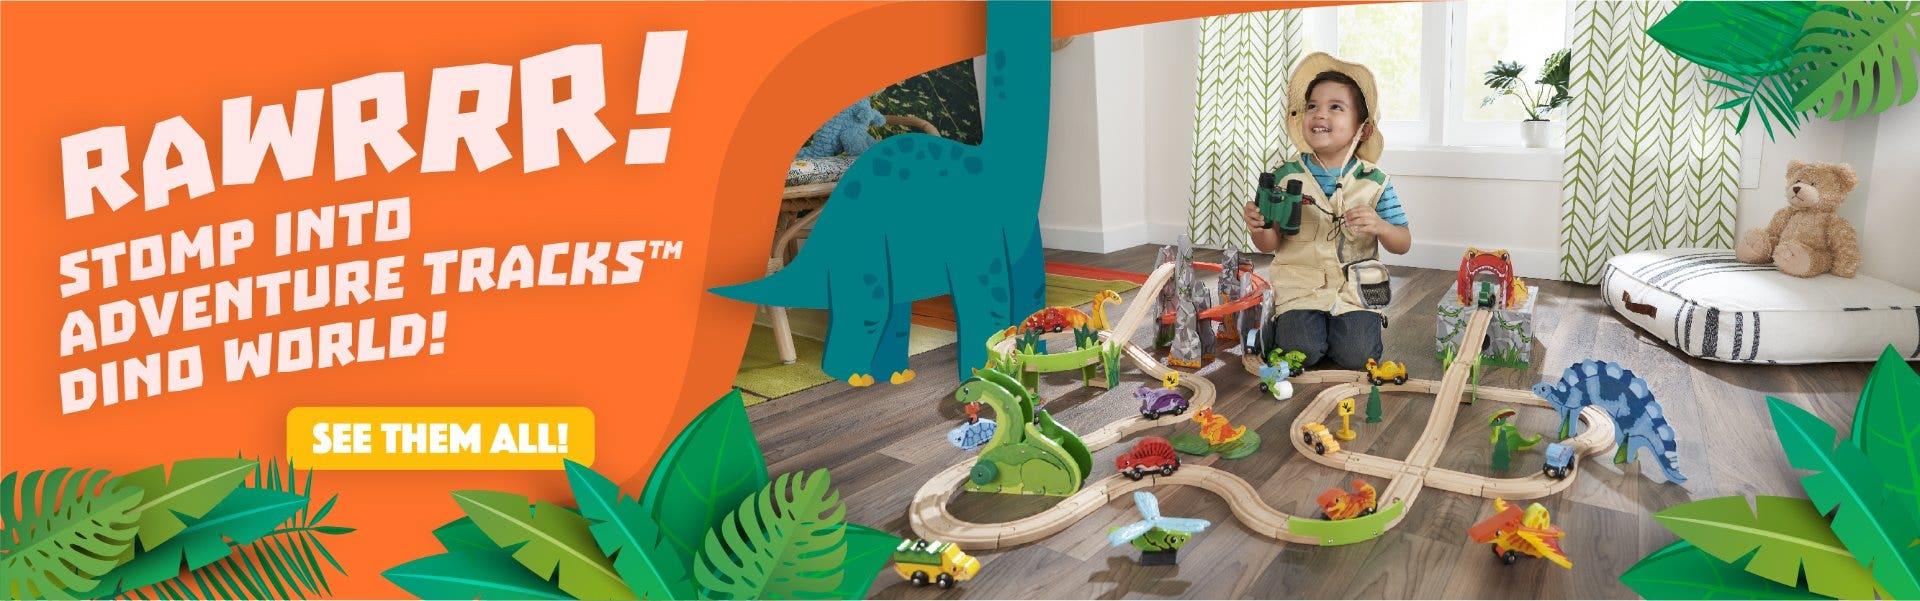 Kid Playing with Kids Dinosaur Train Tracks